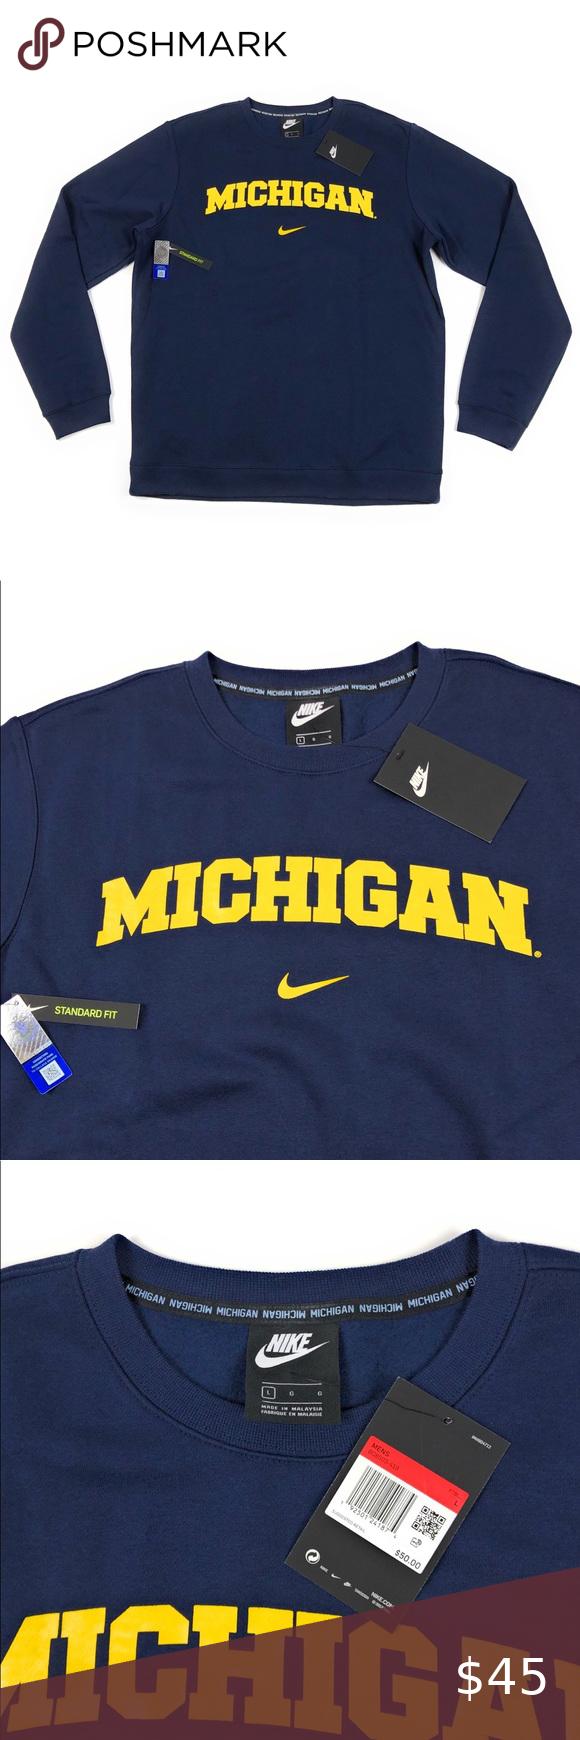 Nike Univ Michigan Wolverines Crewneck Sweatshirt Nike Crewneck Sweatshirt Sweatshirts Yellow Crewneck Sweatshirt [ 1740 x 580 Pixel ]